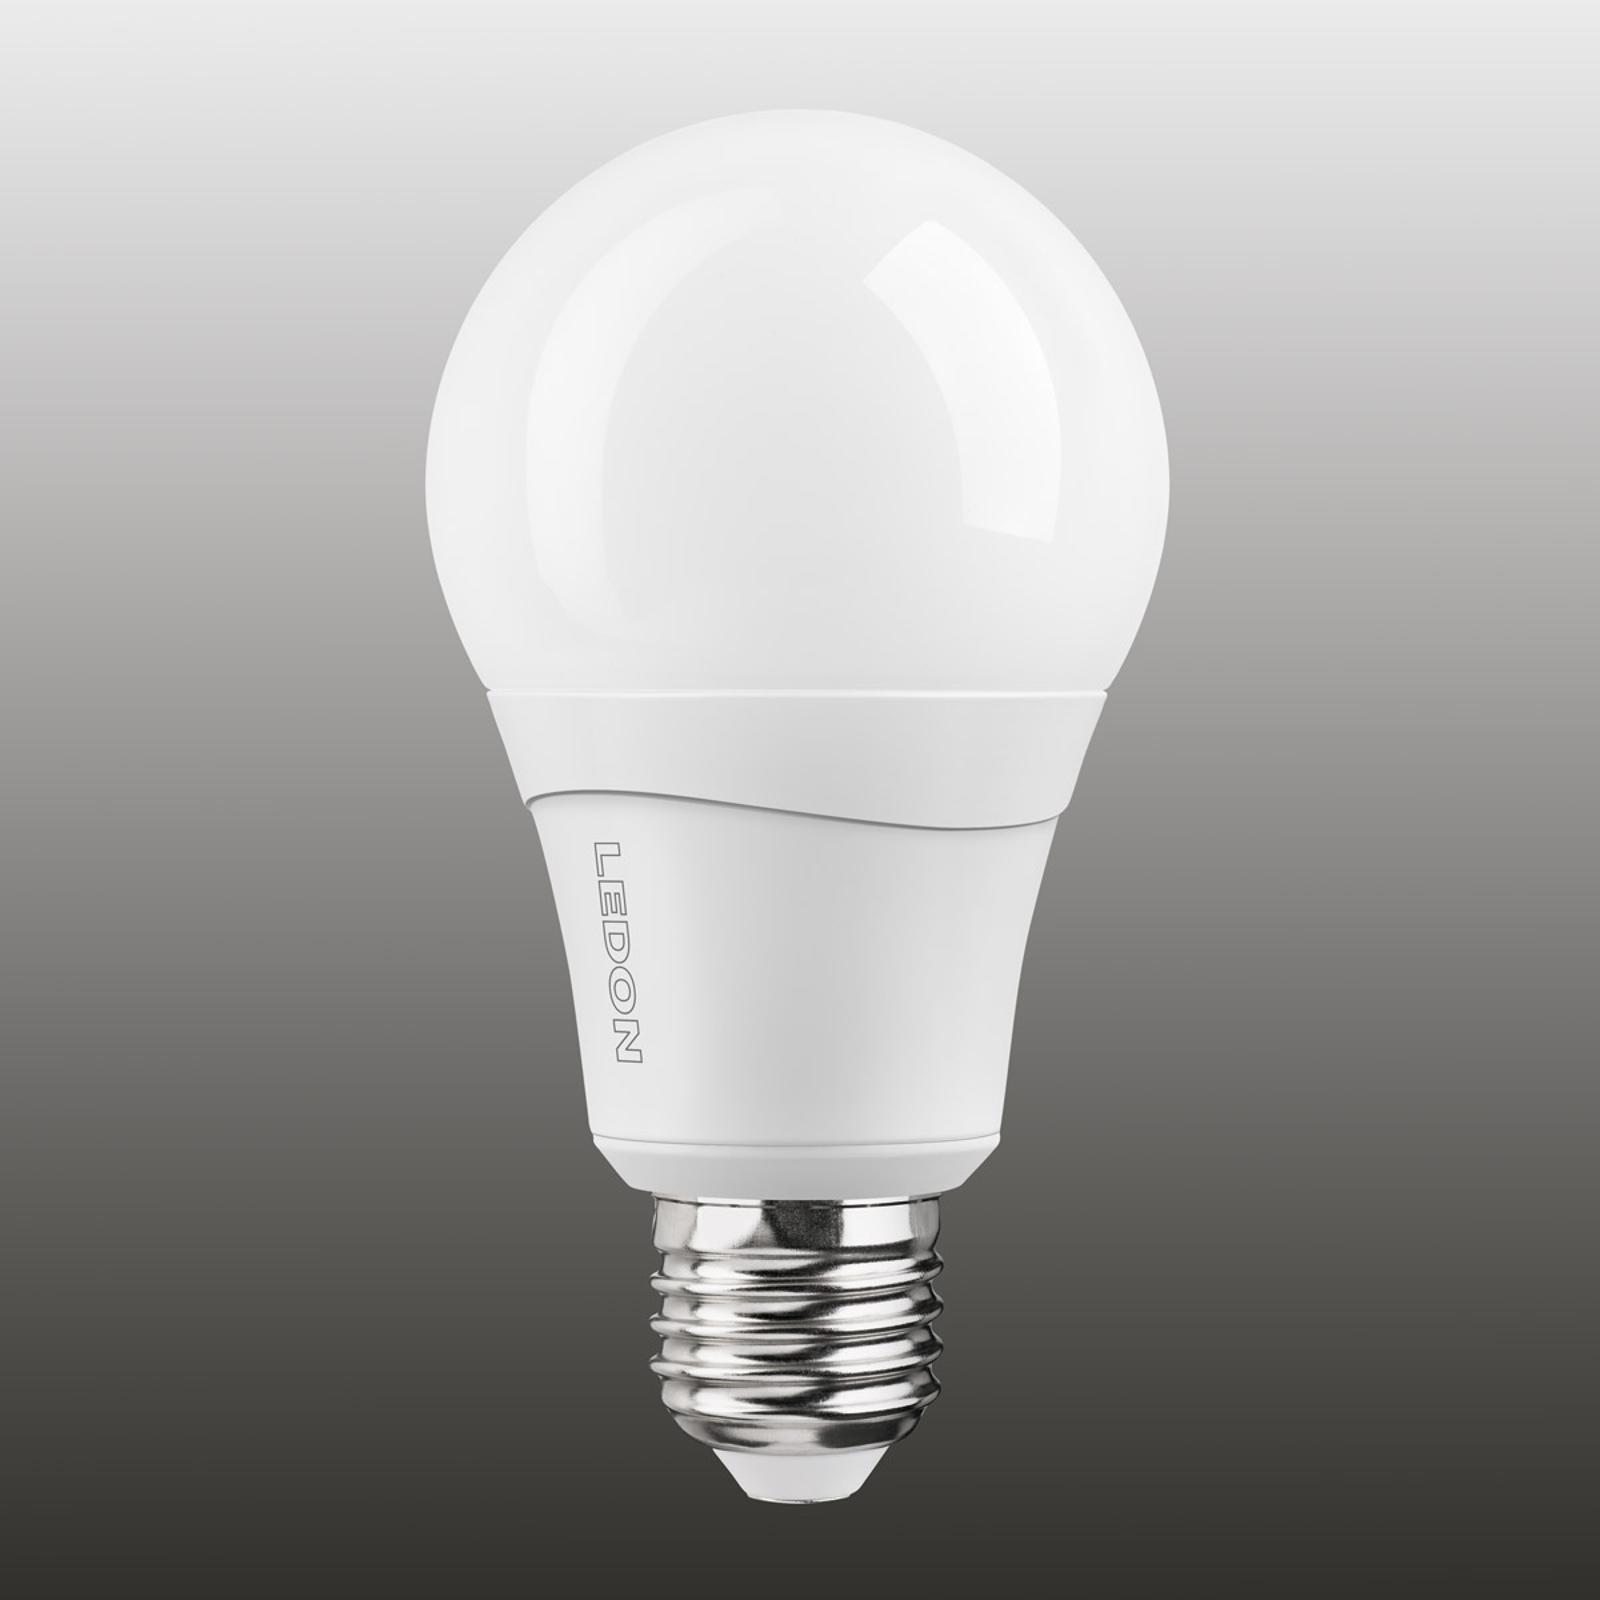 E27 10W LED-Lampe dual color relax (820/827)